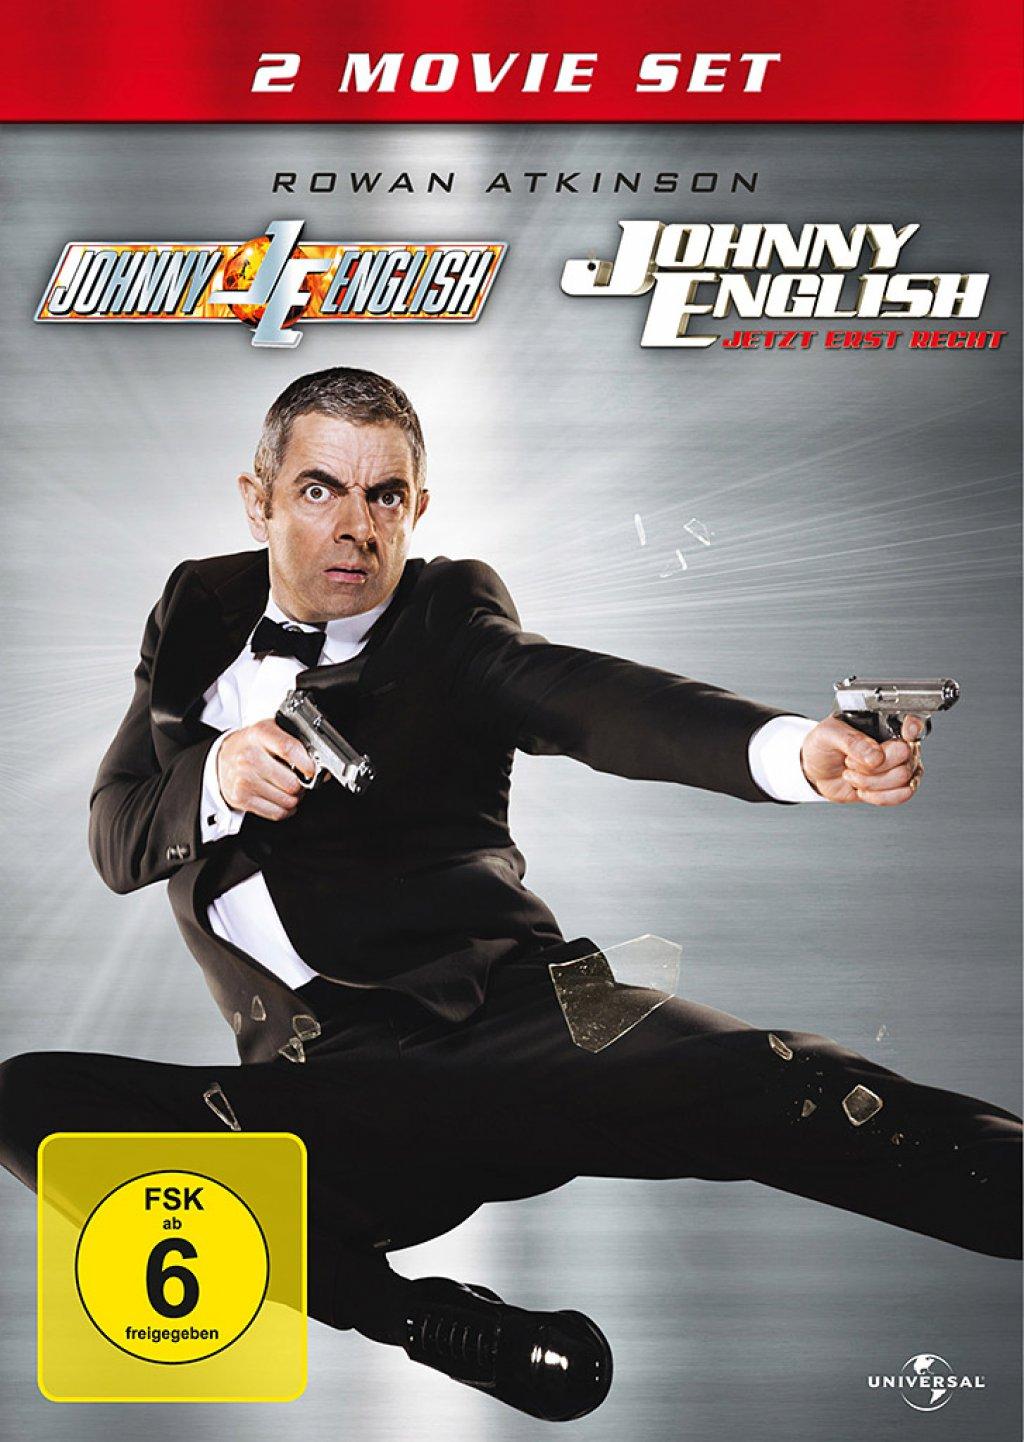 Johnny English & Johnny English - Jetzt erst Recht - 2 Movie Set (DVD)